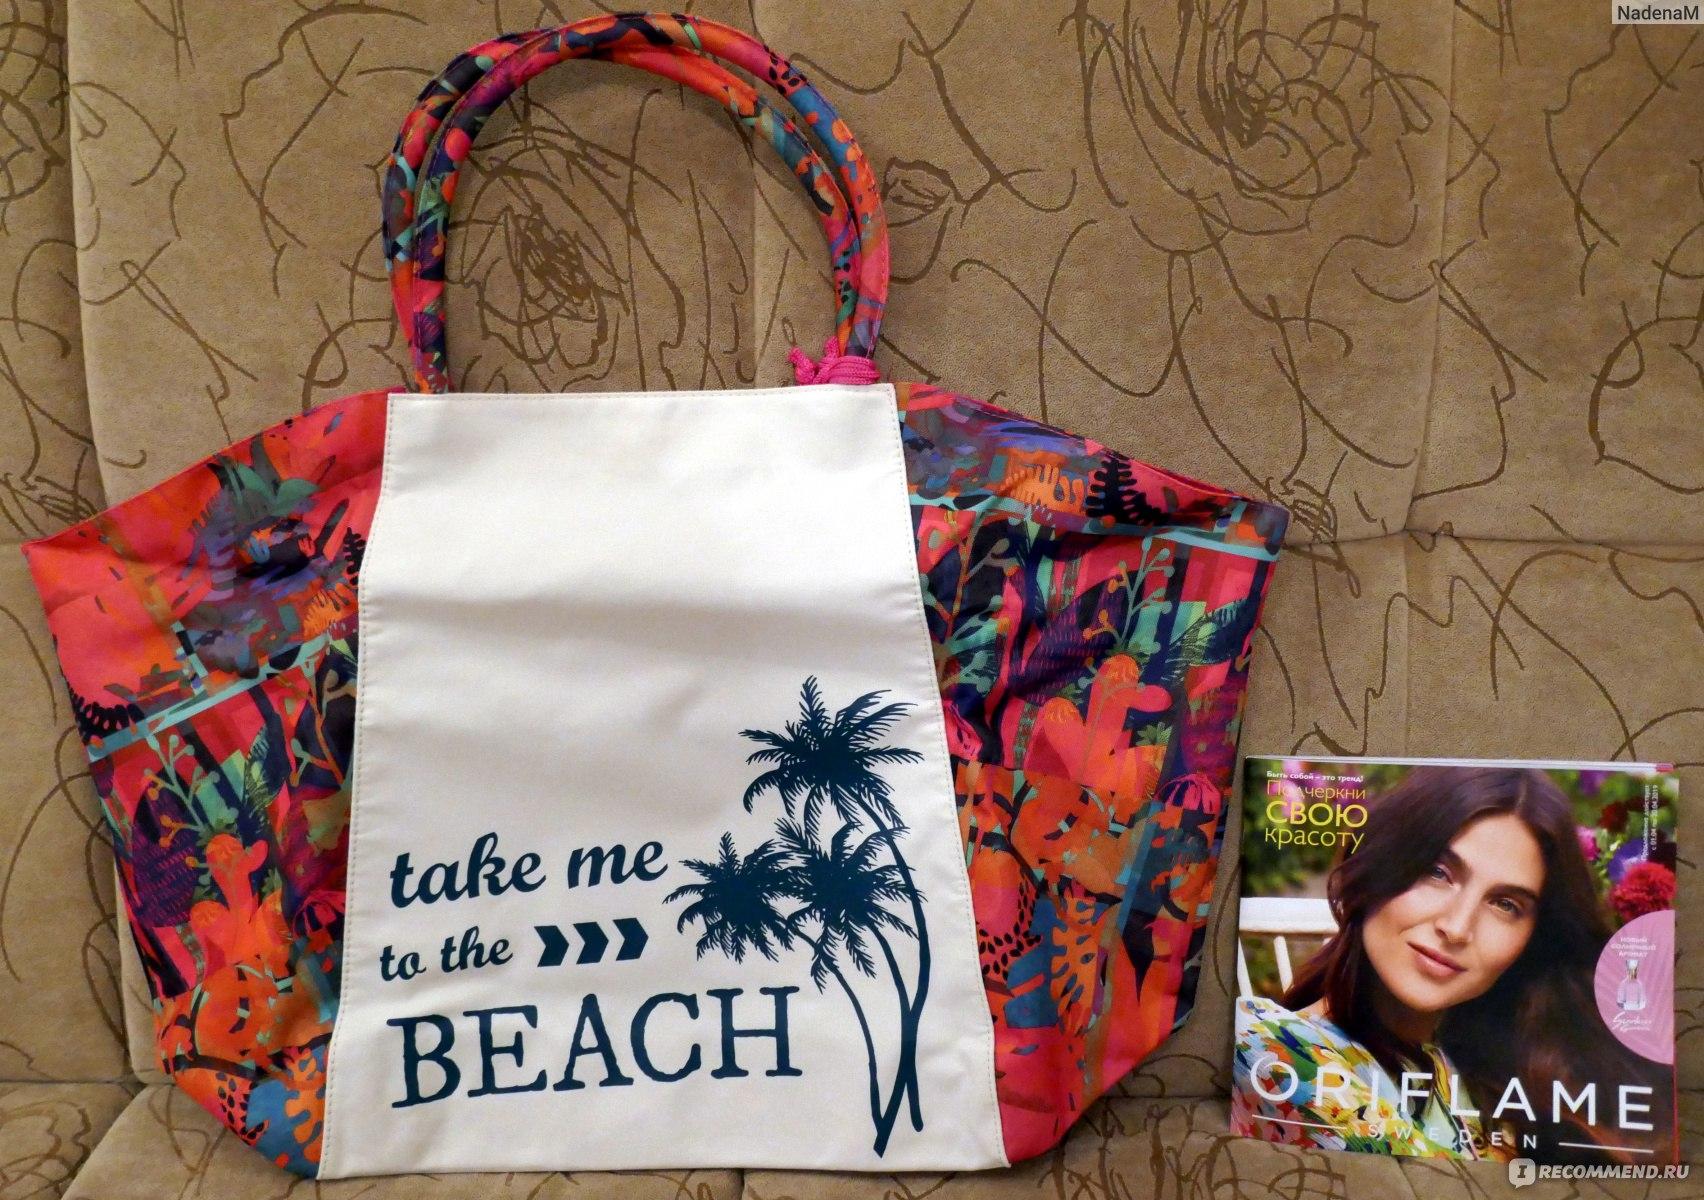 c885cbc3a17d Пляжная сумка Oriflame